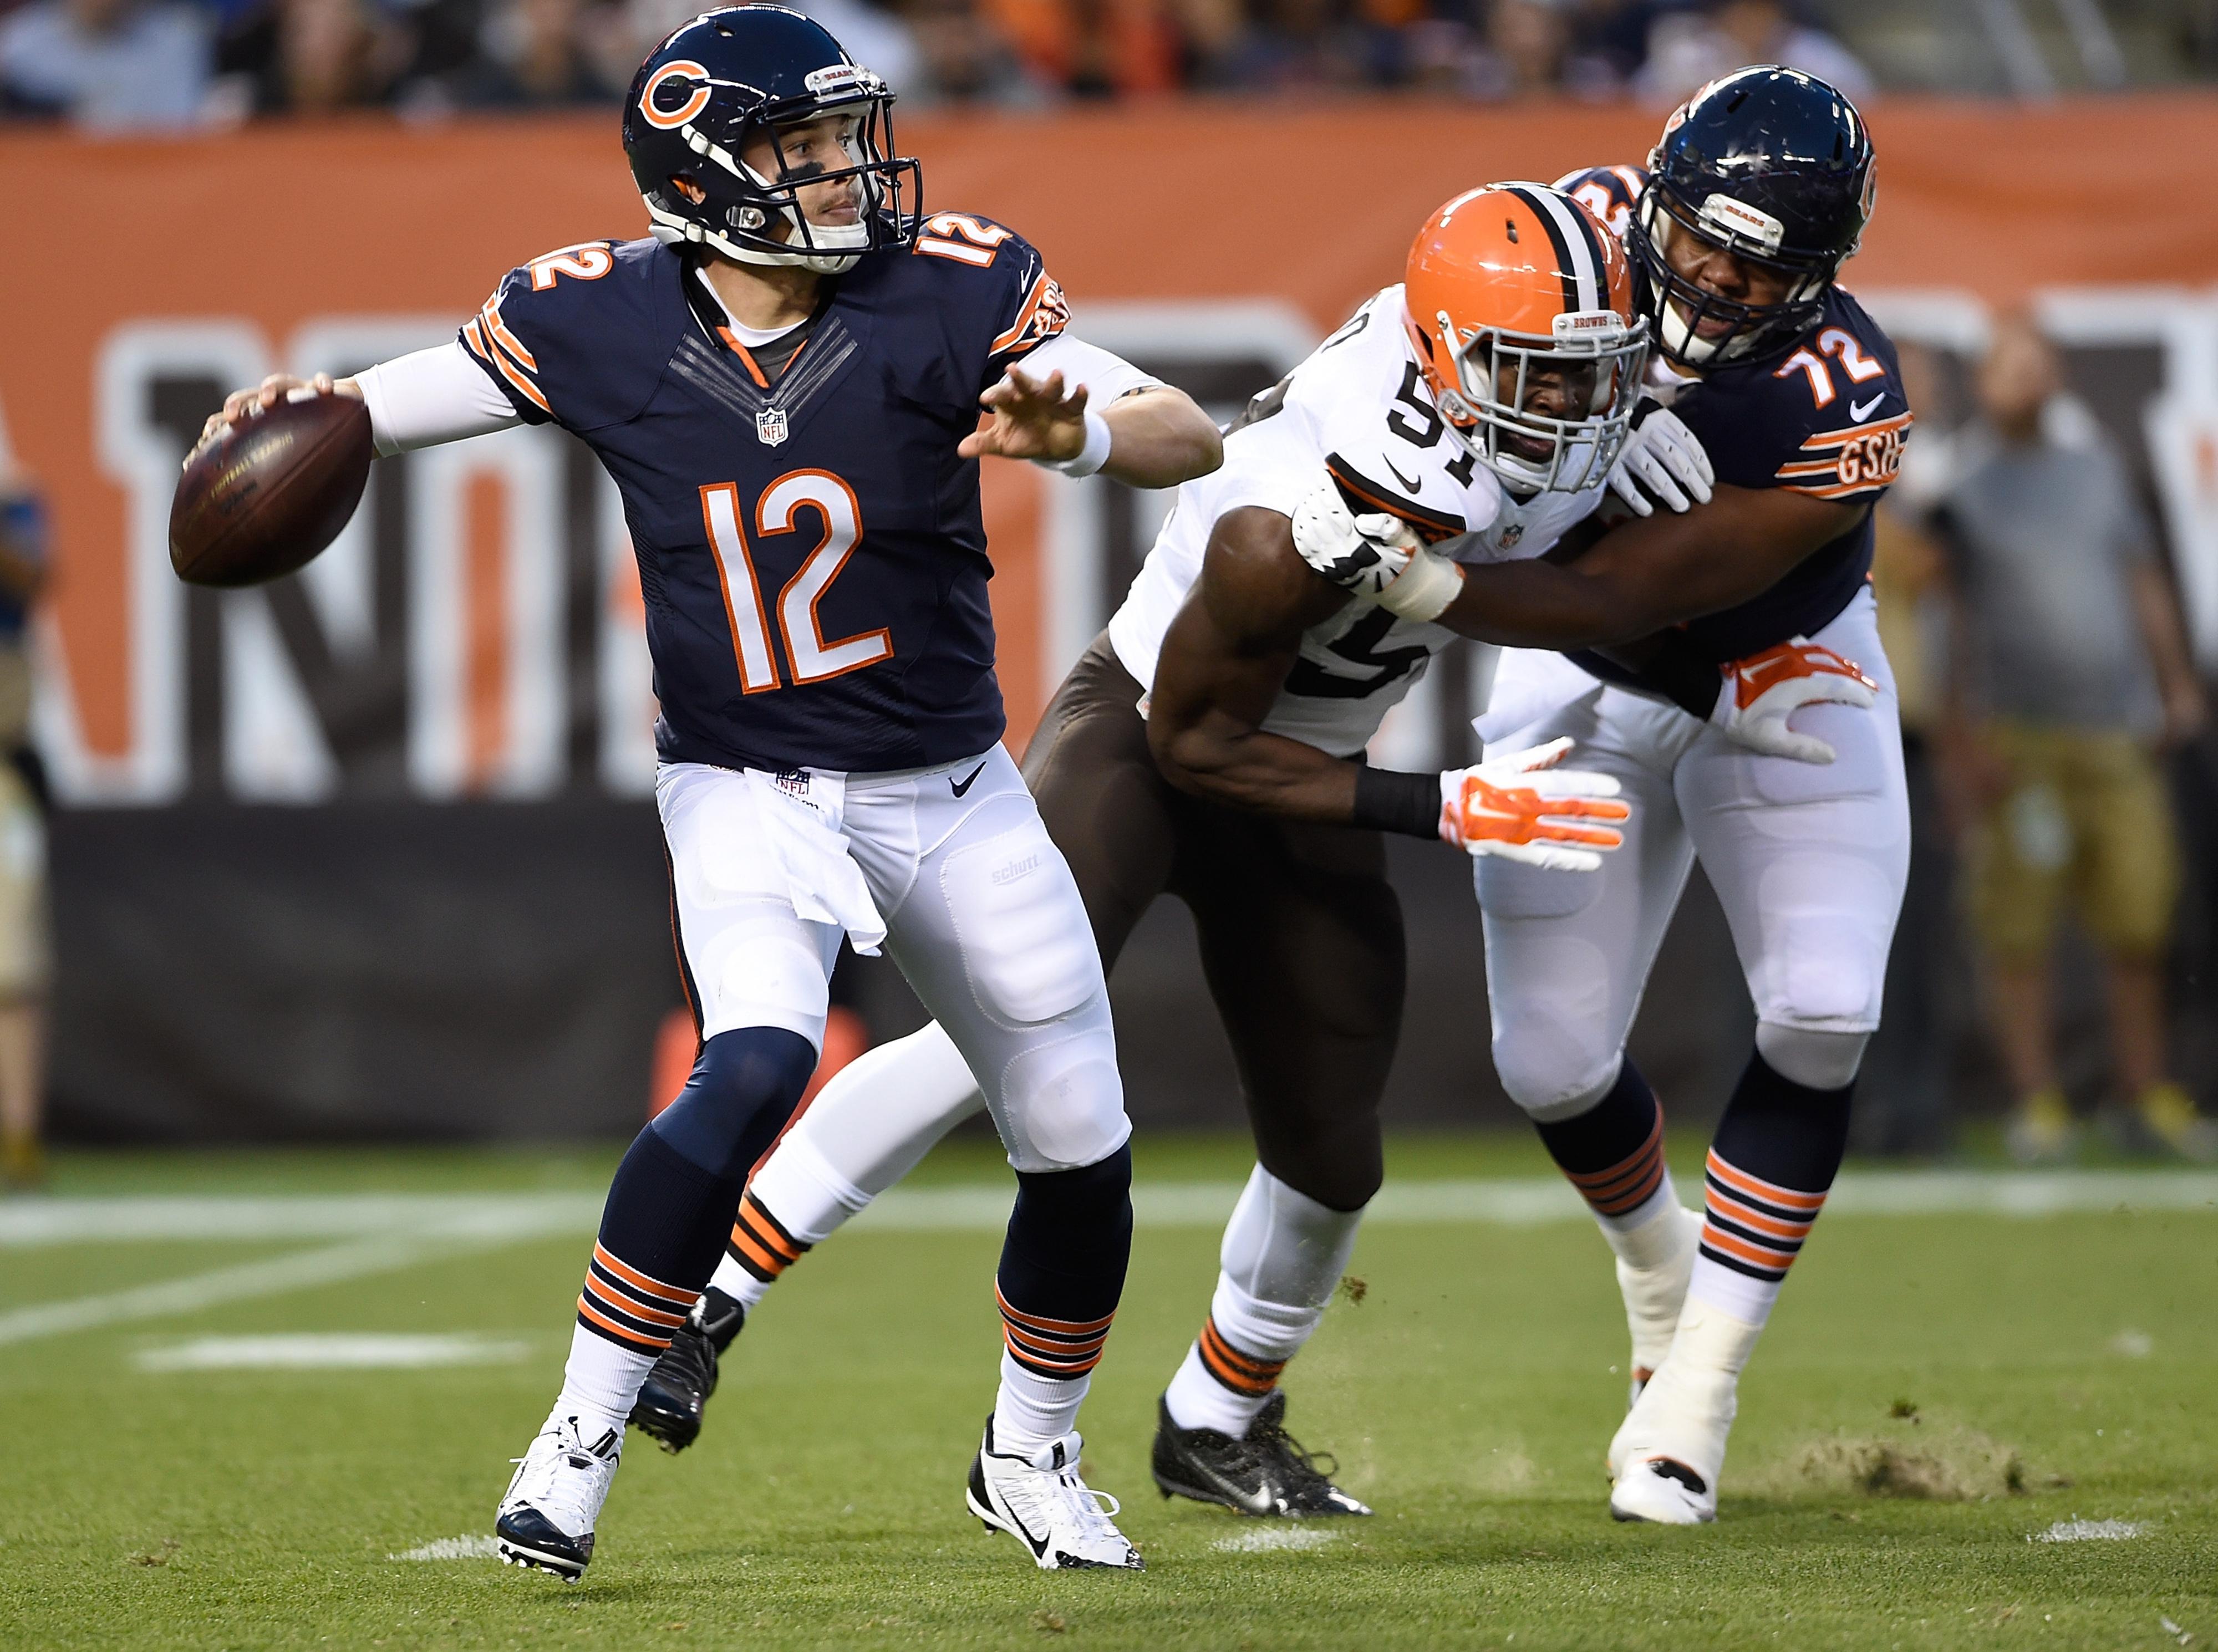 nfl Chicago Bears David Fales GAME Jerseys